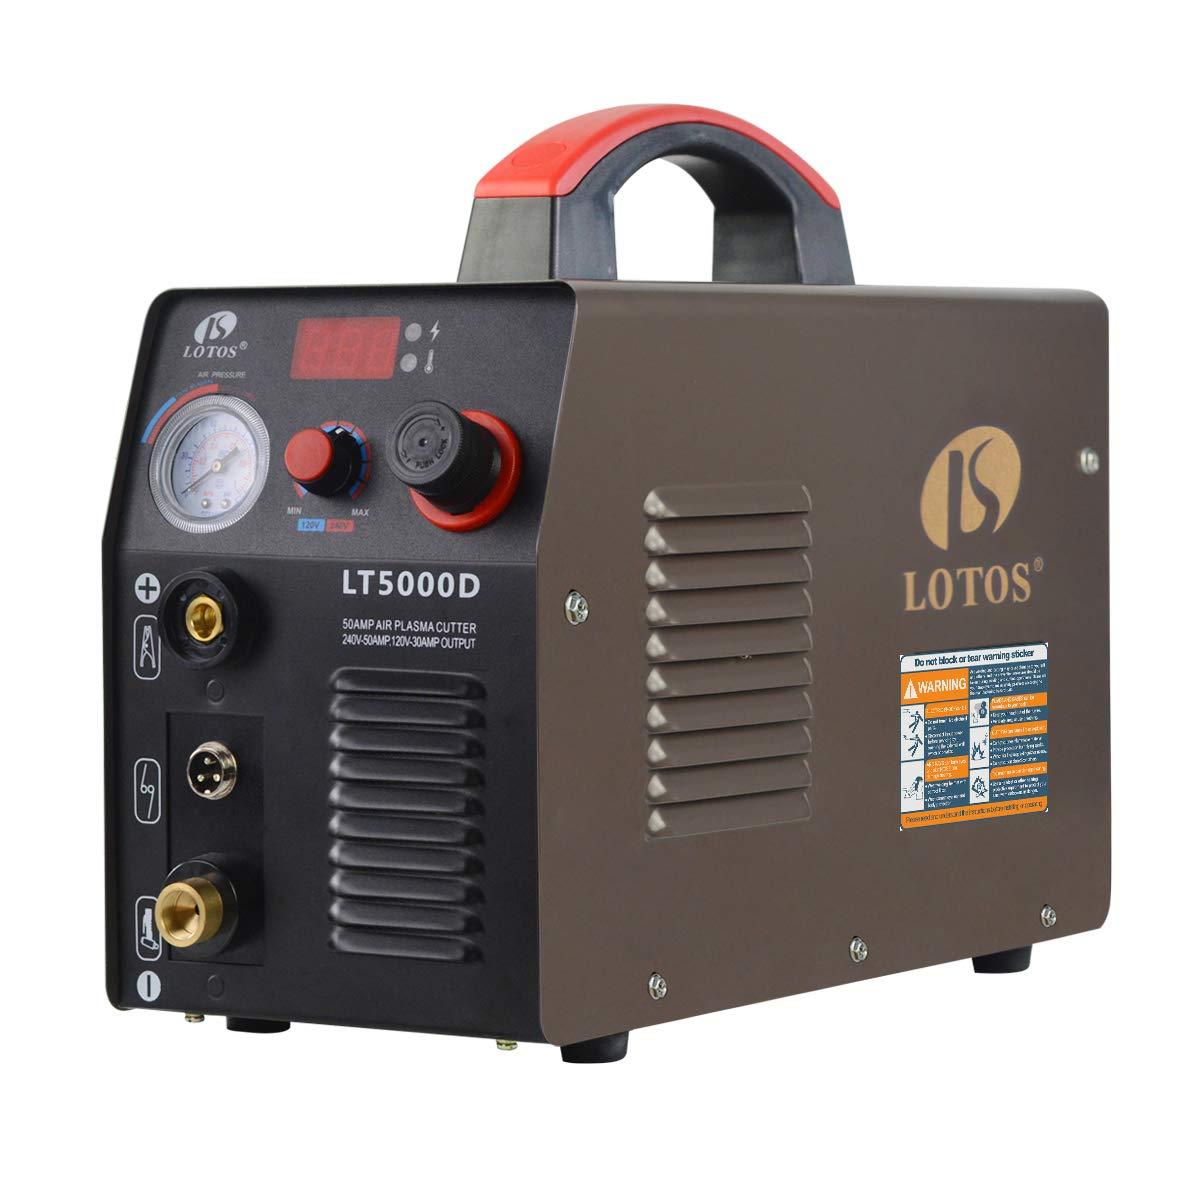 Lotos LT5000D Plasma Cutter 50Amps Dual Voltage Compact Metal Cutter 110/220V AC 1/2